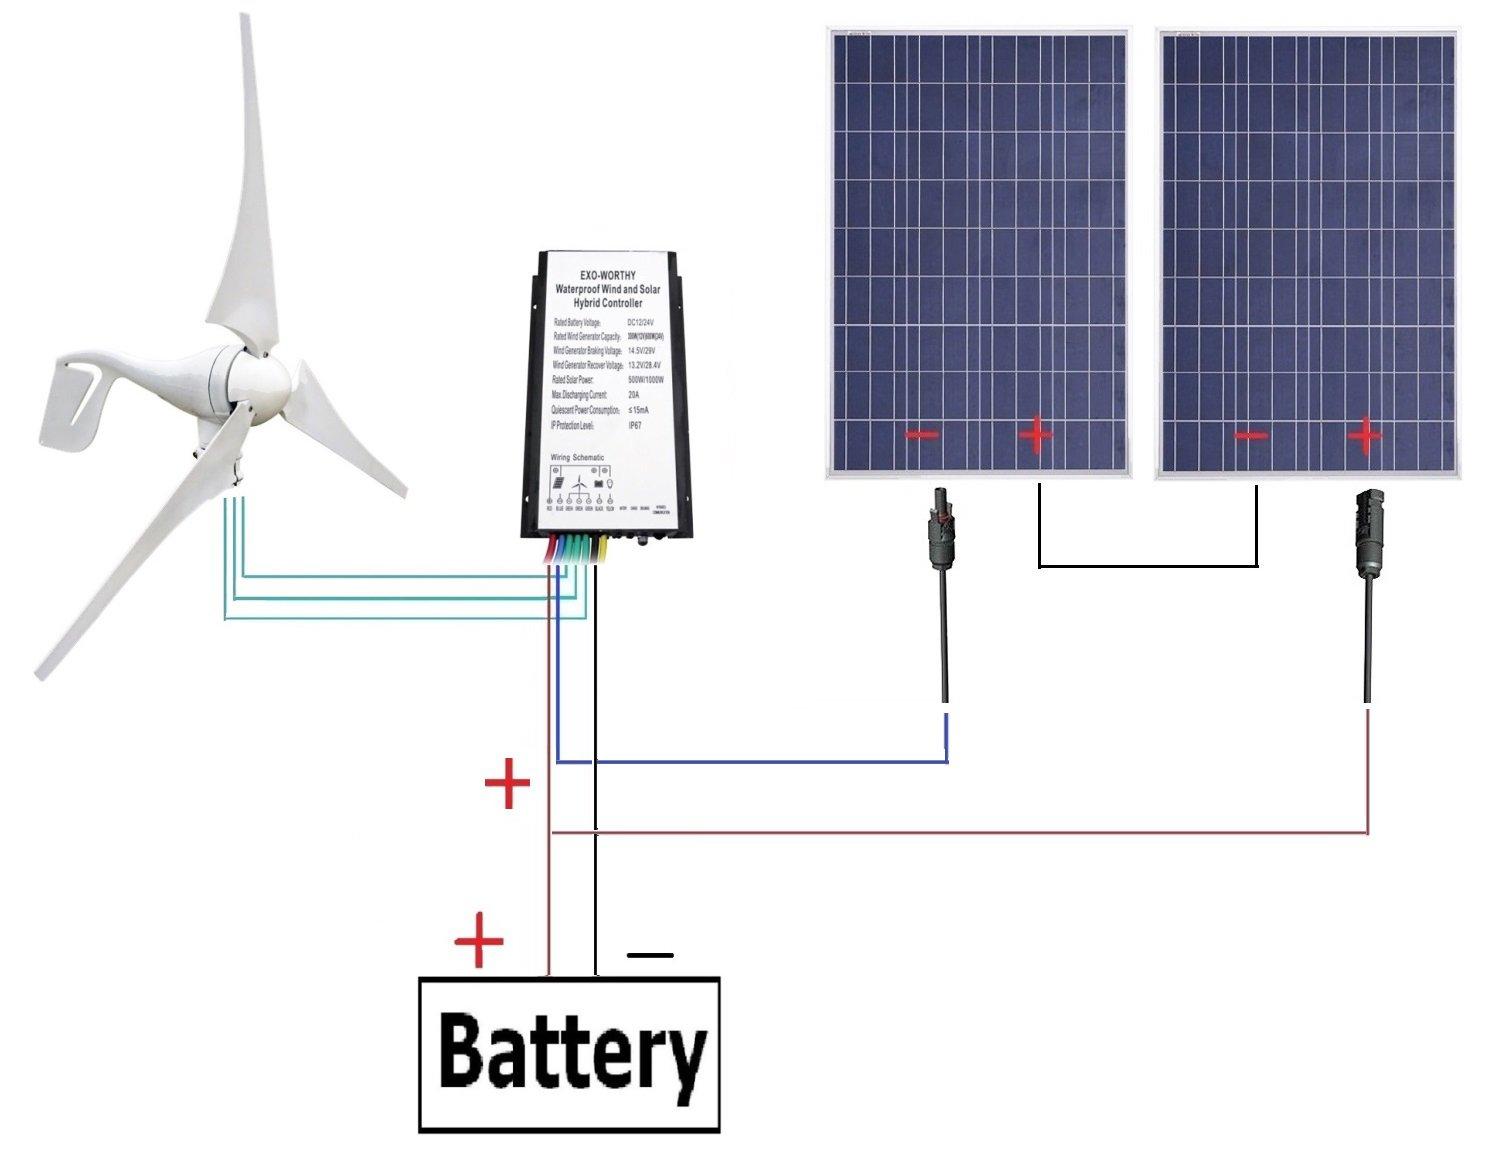 Buy Eco Worthy 1kw 24v Polycrystalline Off Grid Solar Kit 10pcs 12v Panel Wiring Diagram 24 Volts 600 Watts Wind Power 1pc 400